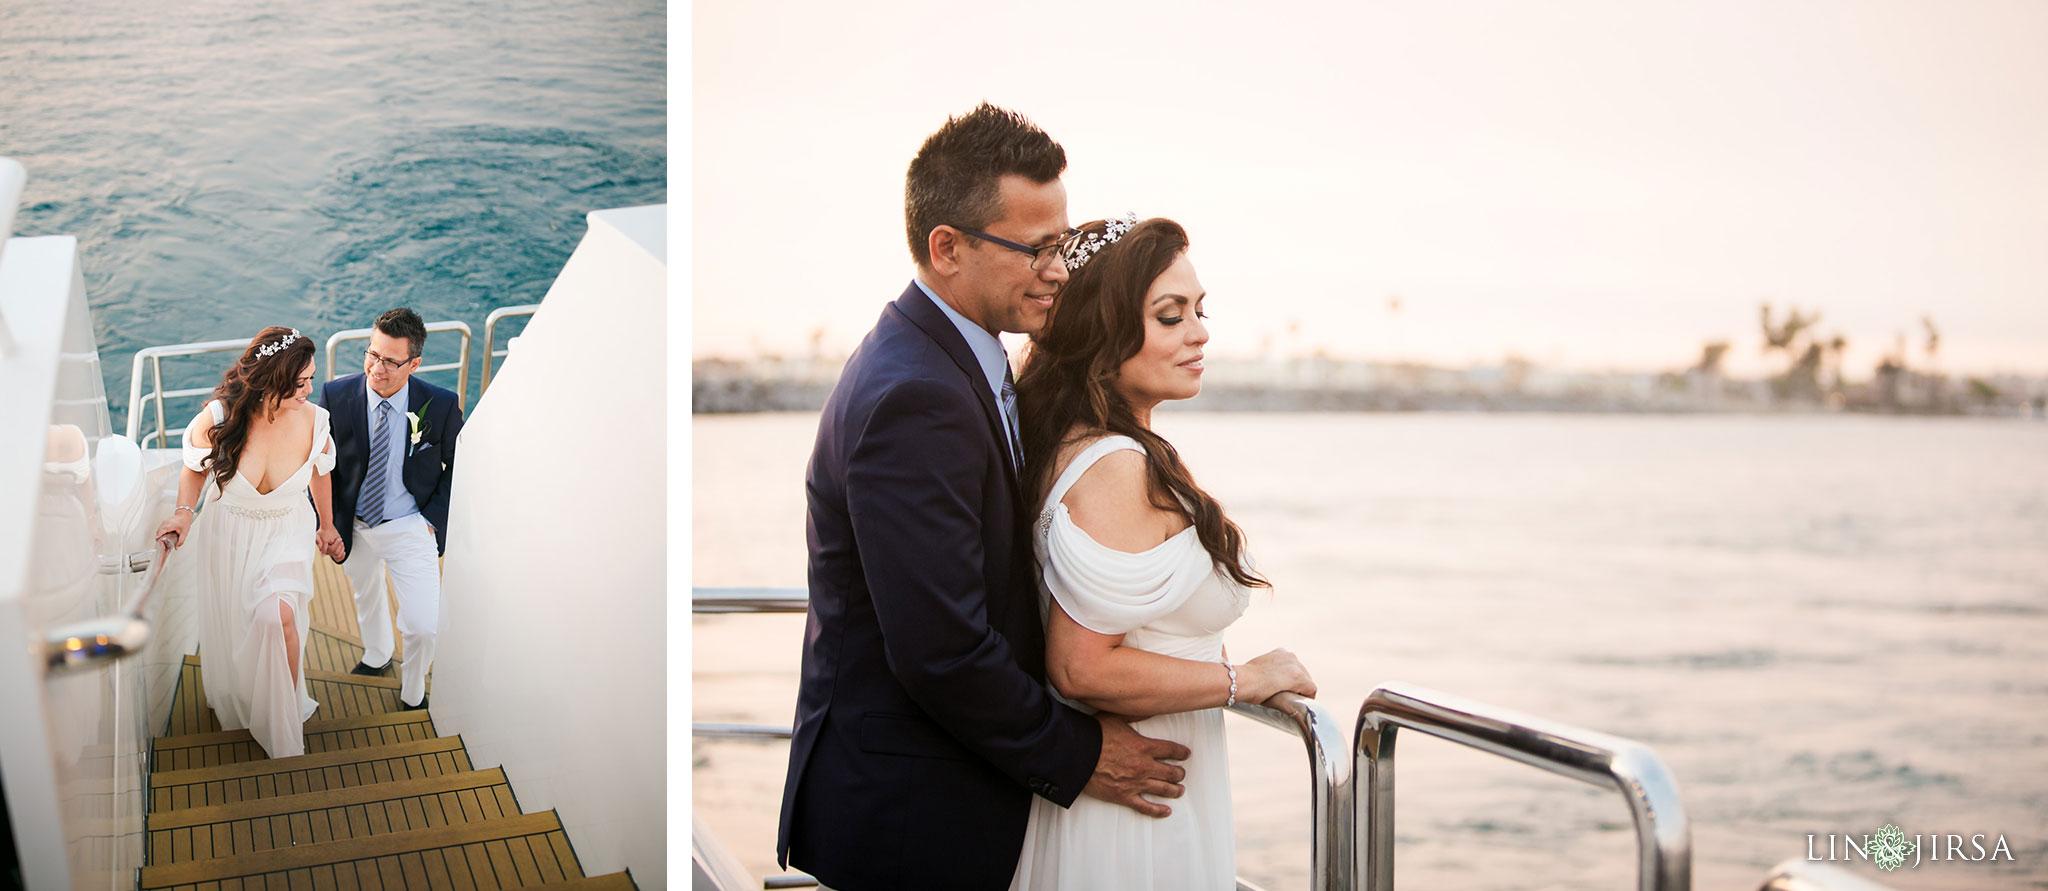 018 charter yachts newport beach wedding photography